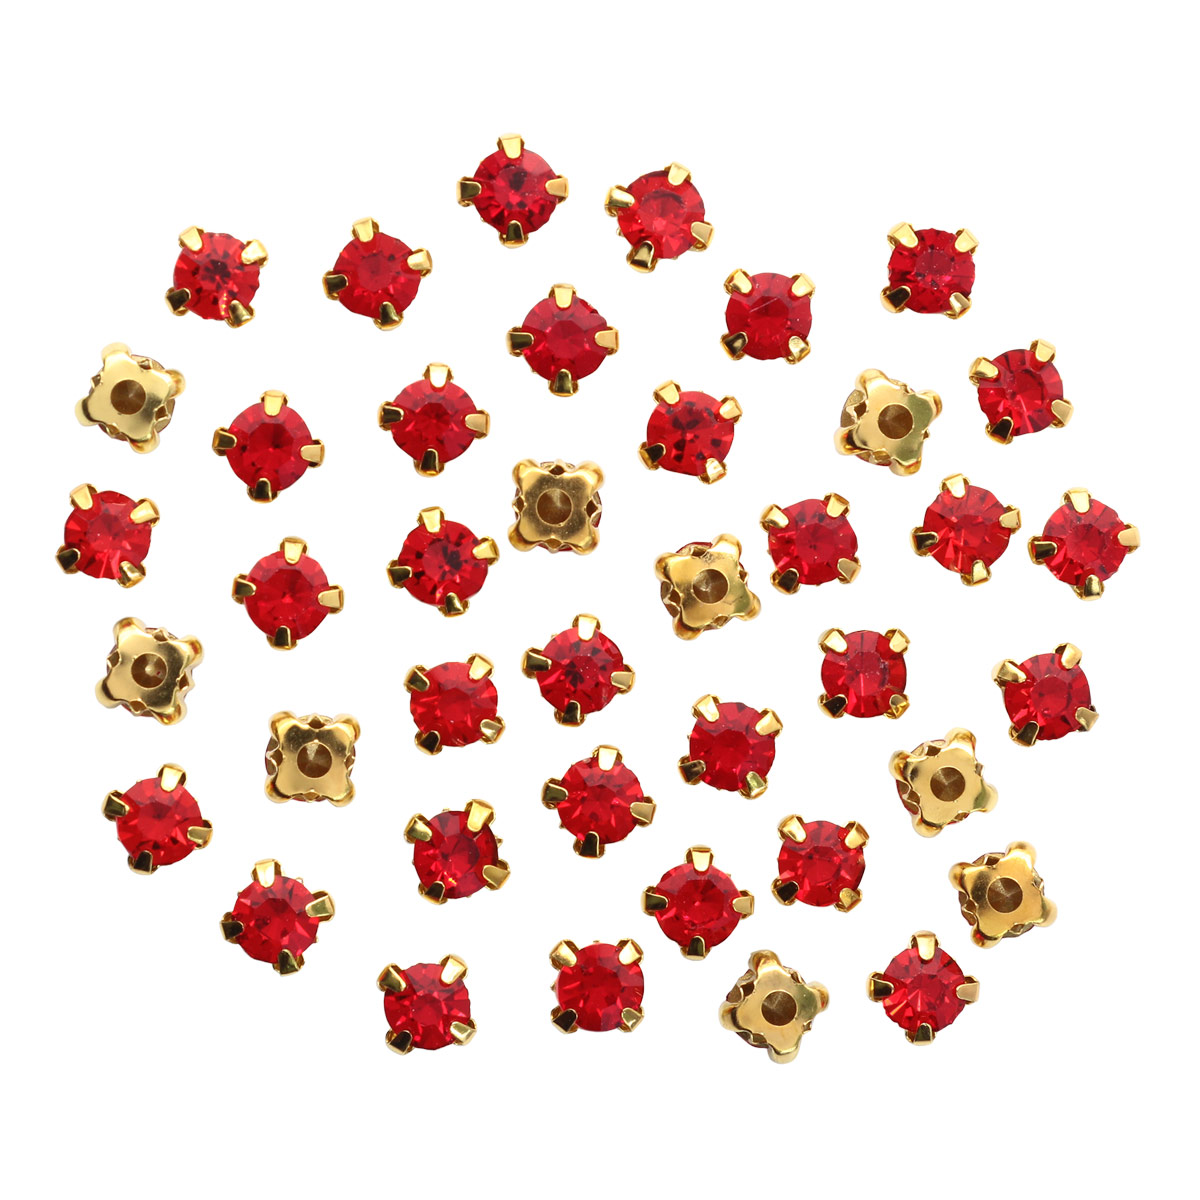 Стразы в цапах 6мм, 6 цветов, цвет оправы золото, Астра